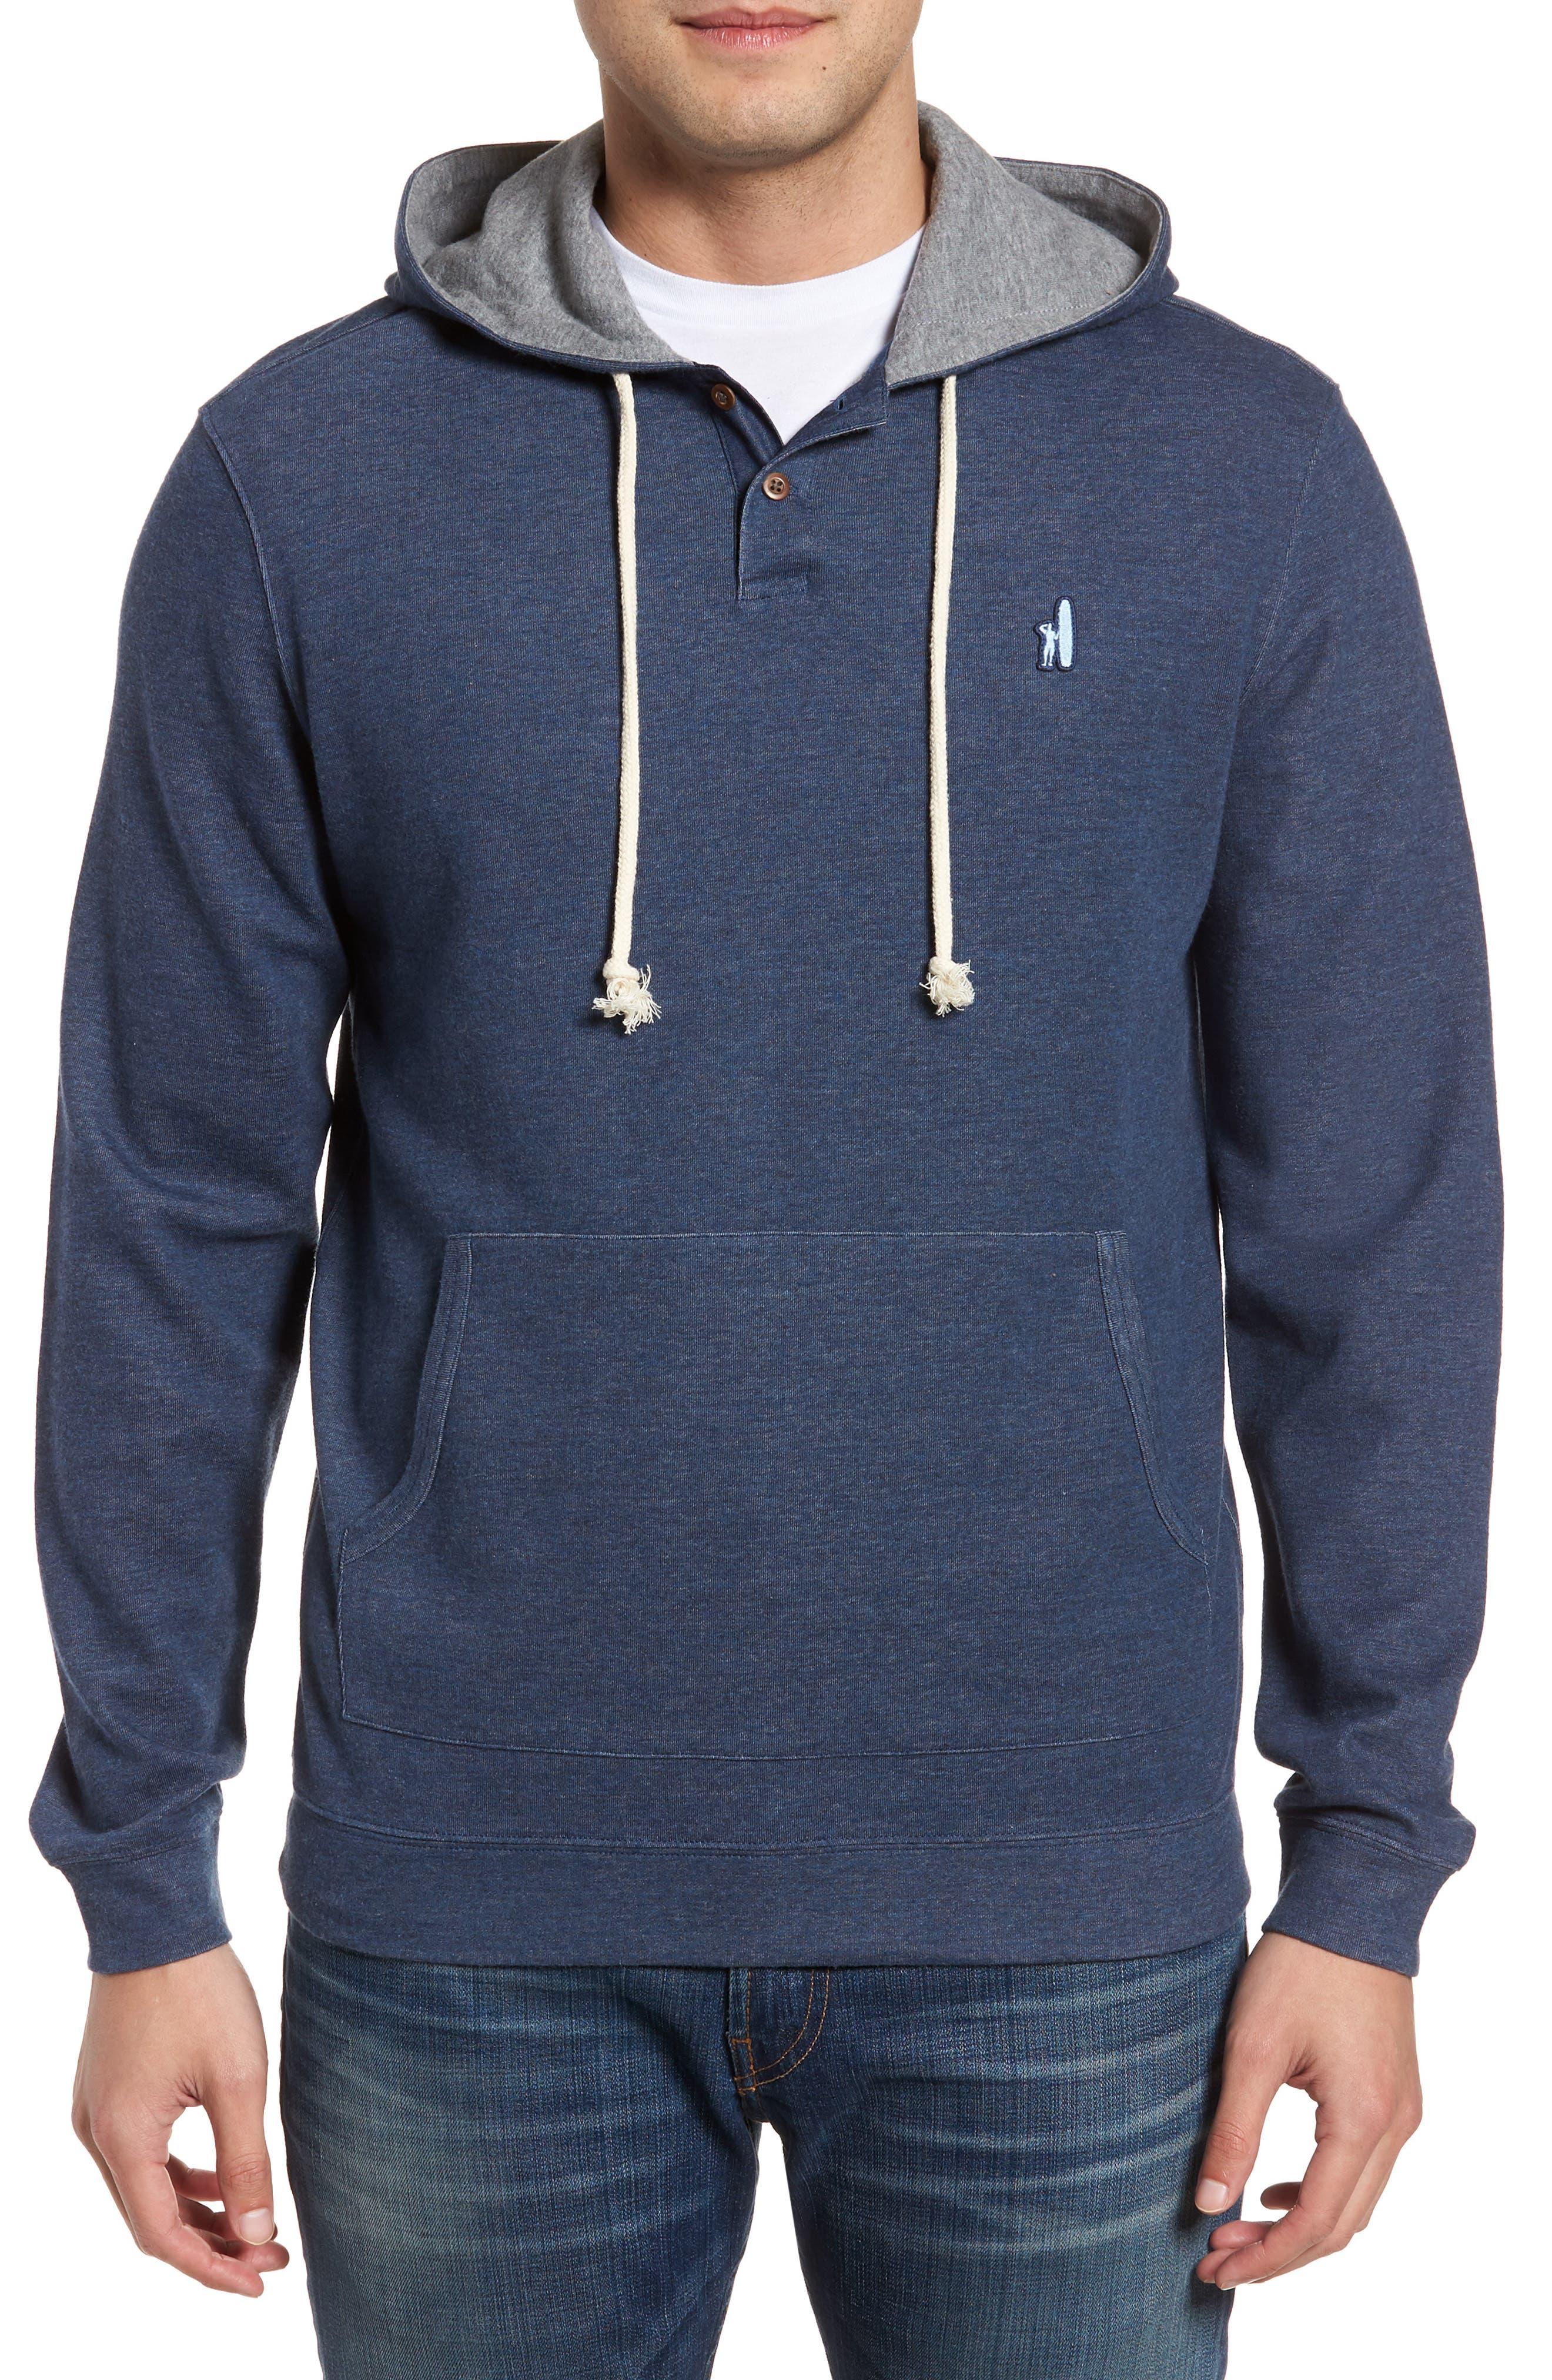 Layton Regular Fit Pullover Hoodie,                             Main thumbnail 1, color,                             BLAZER